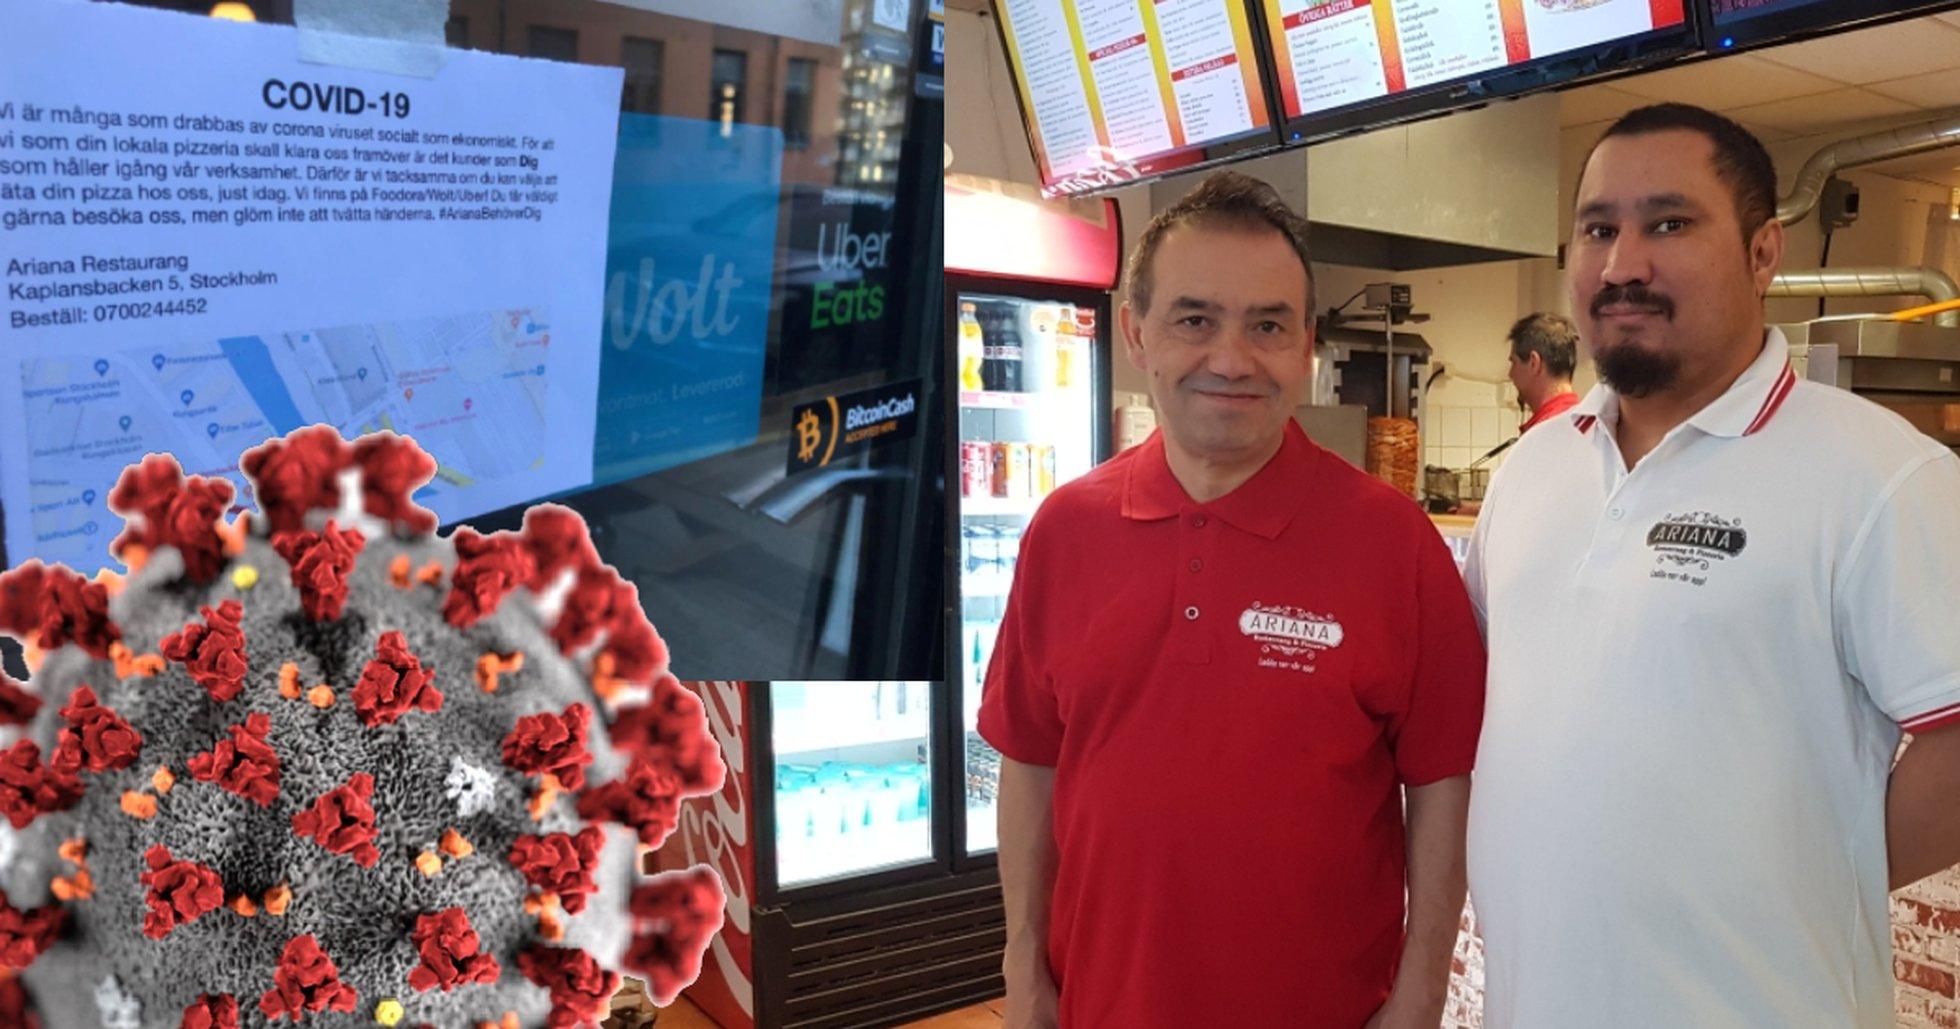 Swedish bitcoin pizza place risks bankruptcy due to coronavirus.